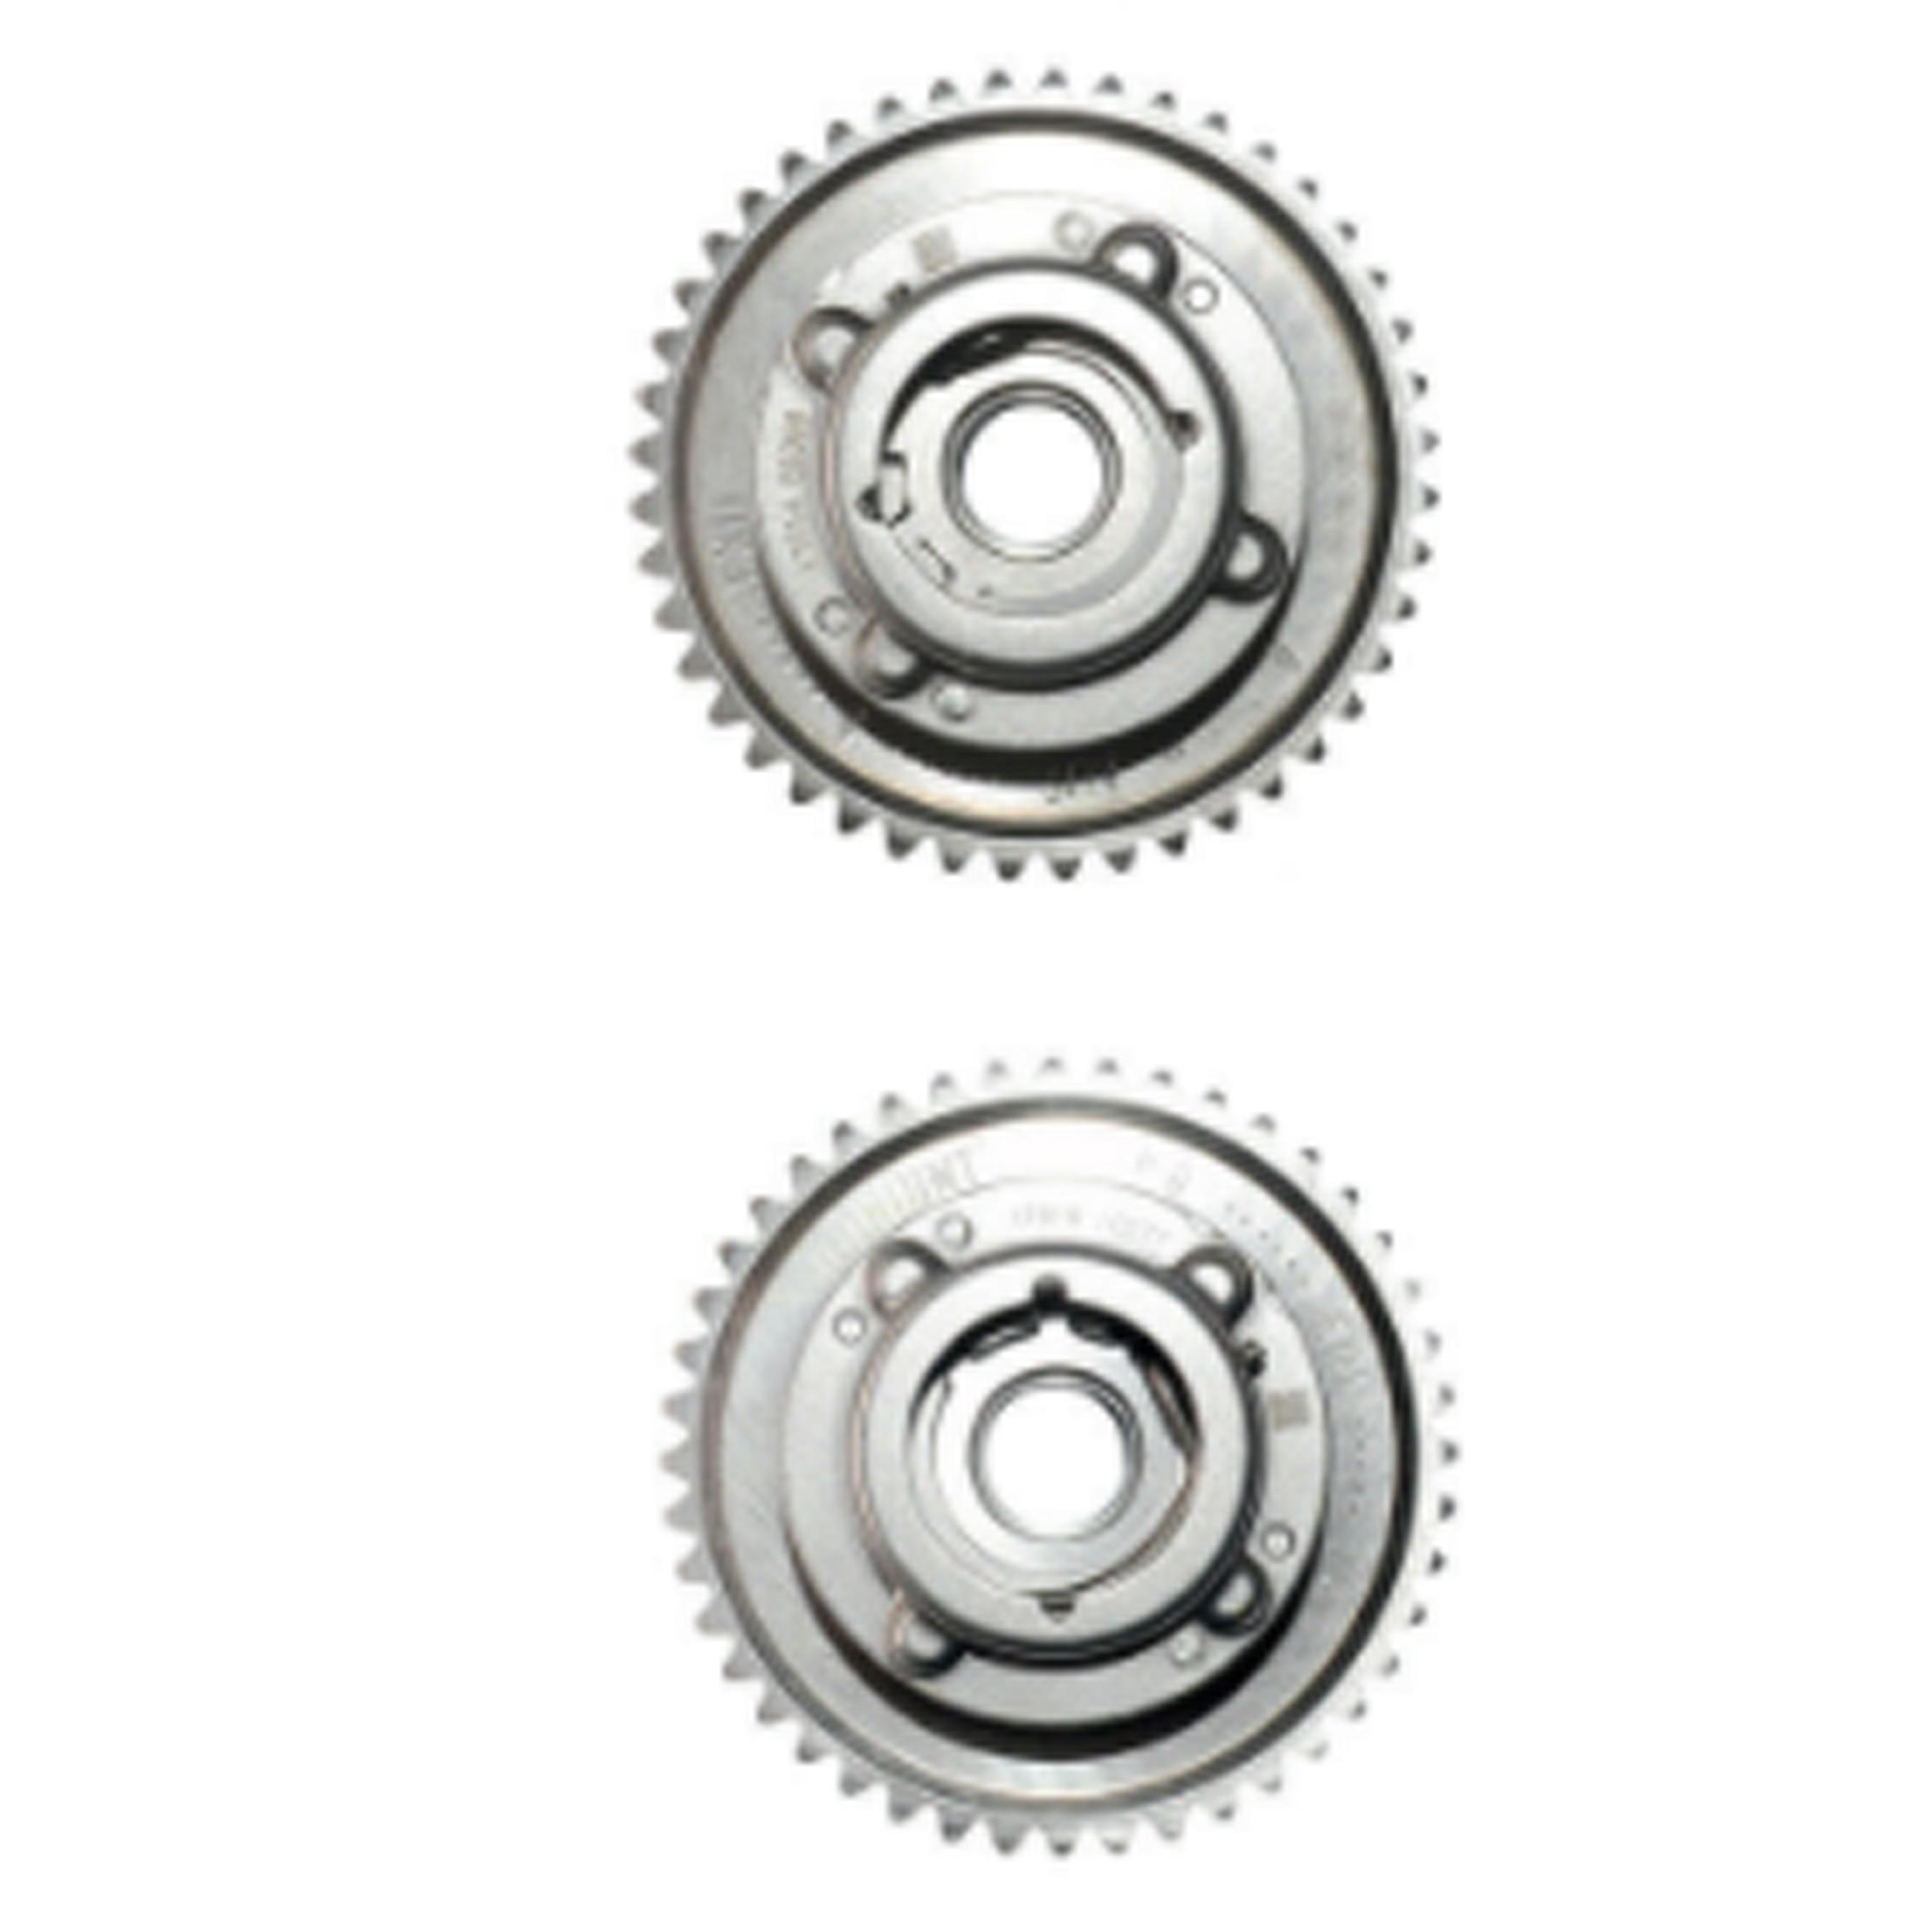 Balance Shaft Chain Tensioner for Mercedes-Benz W203 C230 C250 SLK250